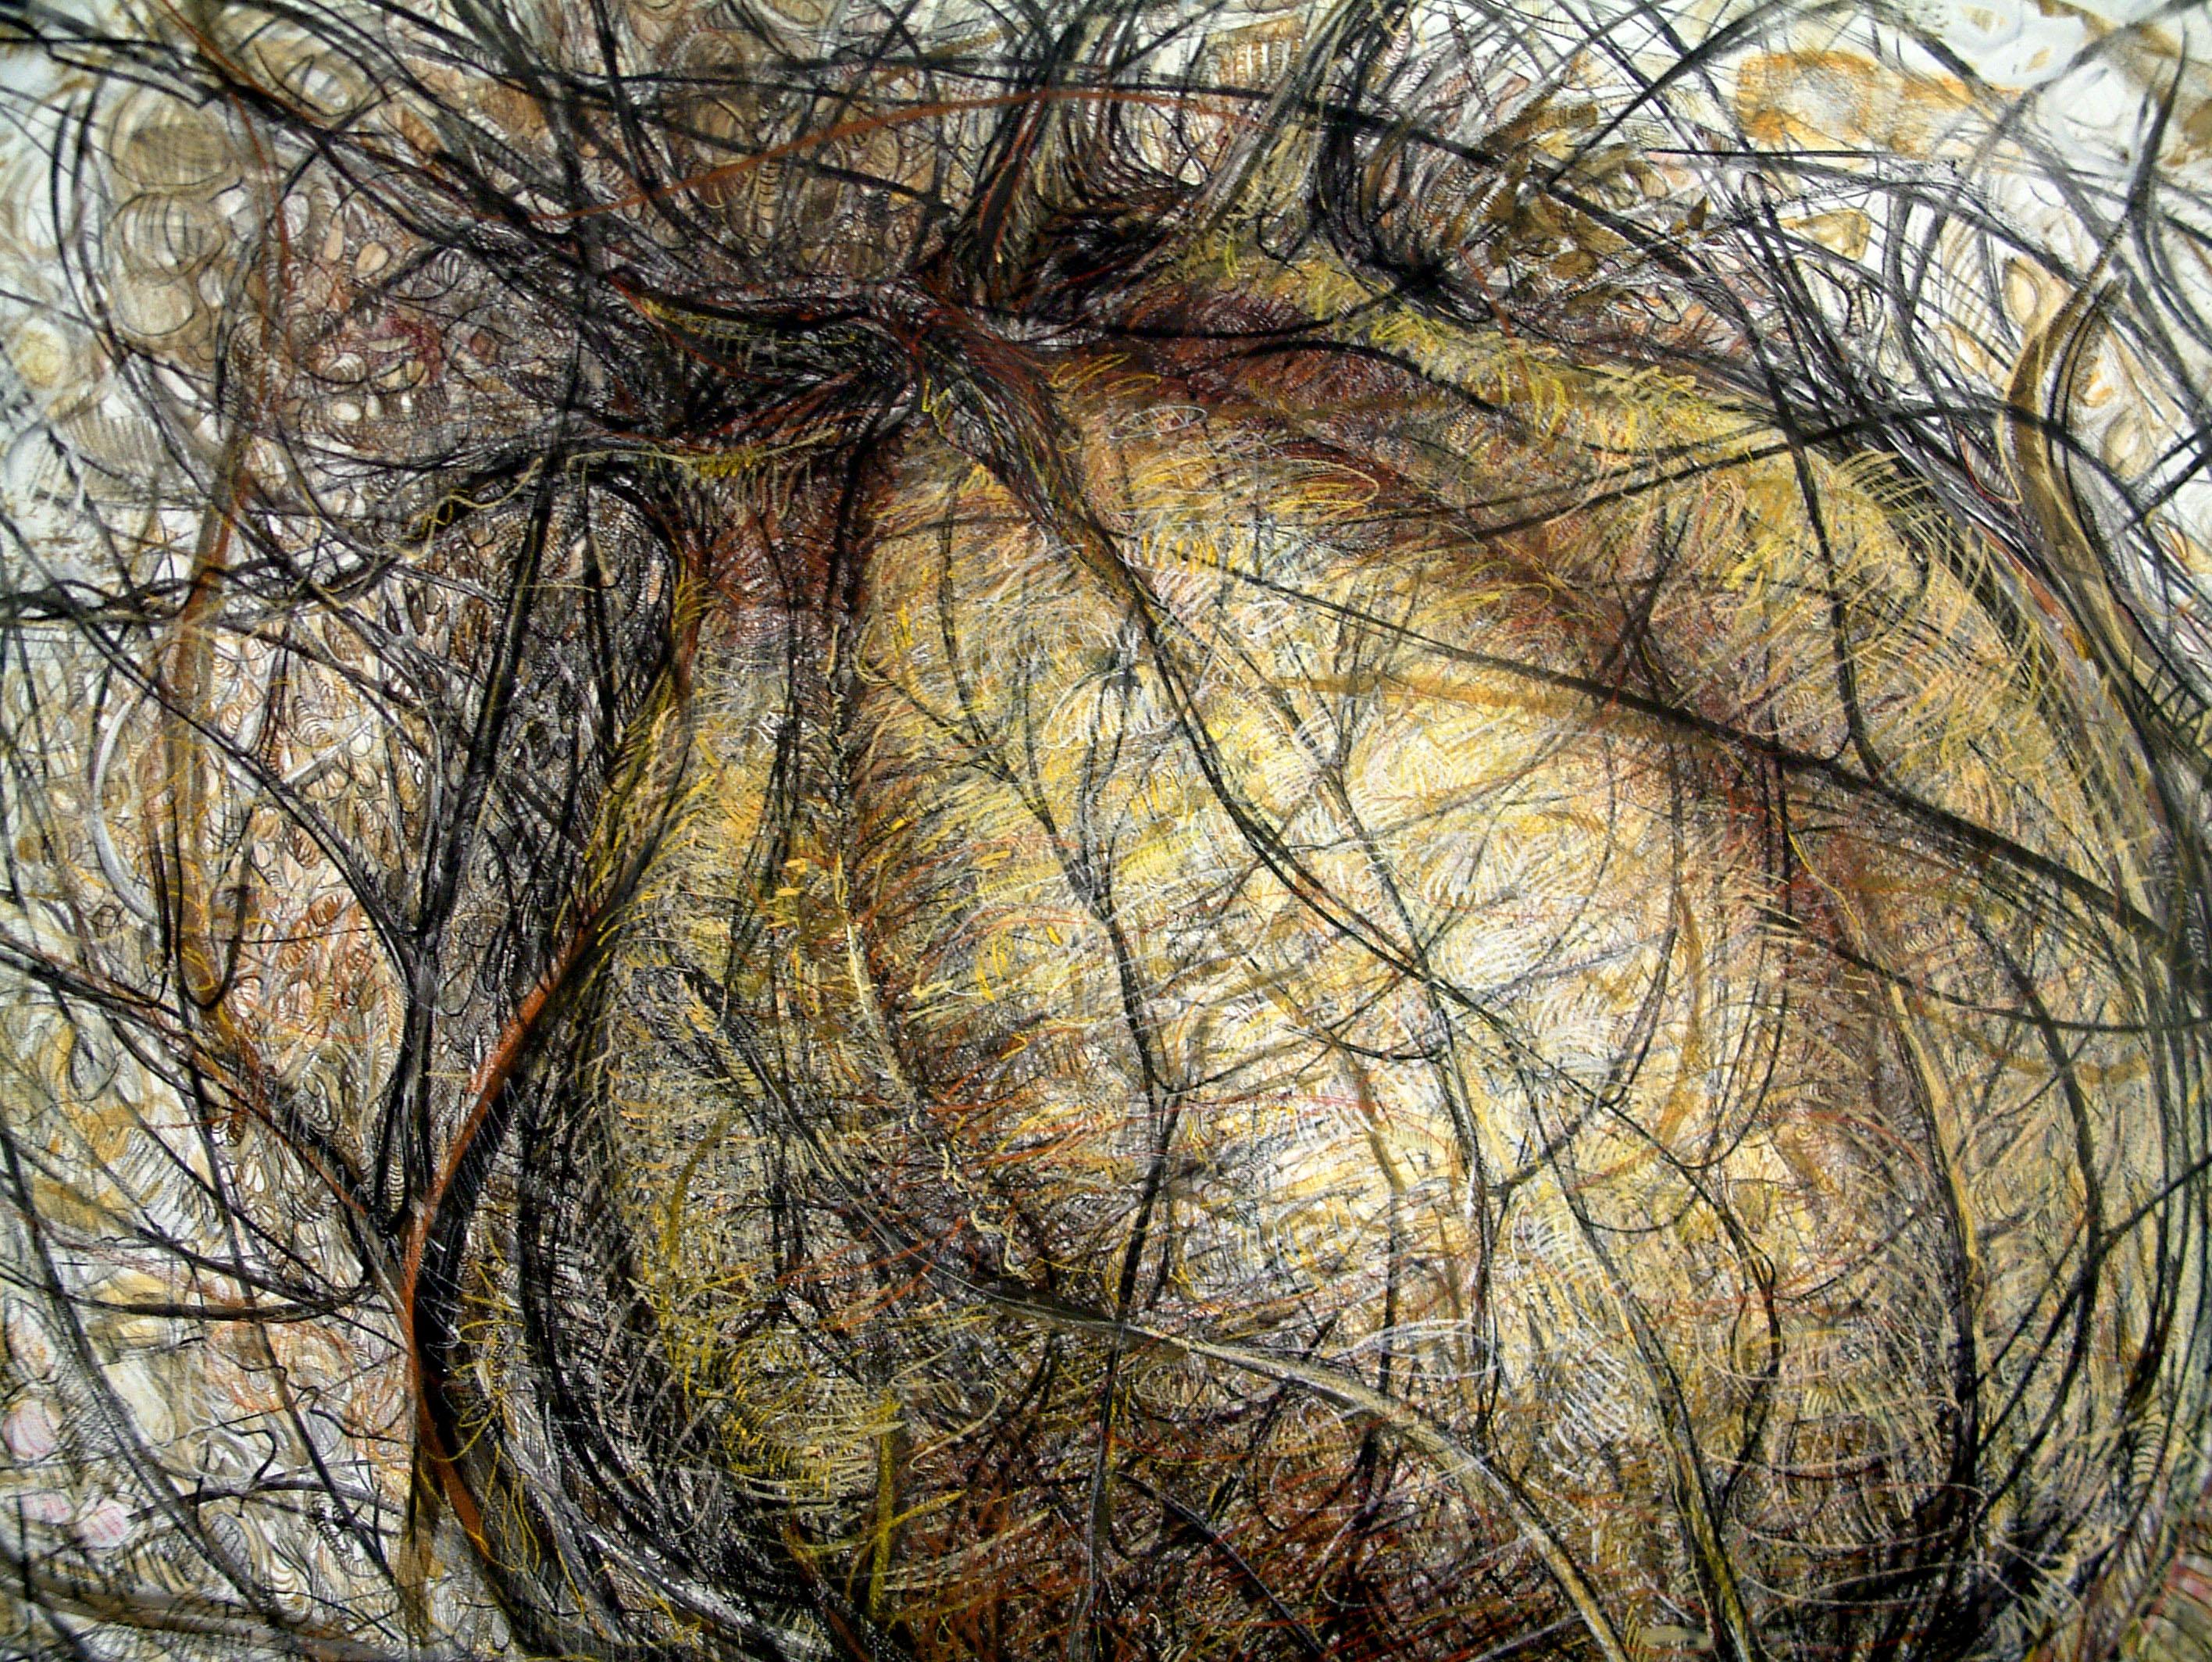 rohini-devasher-copyright-seed-wall-drawing-2004 (7)